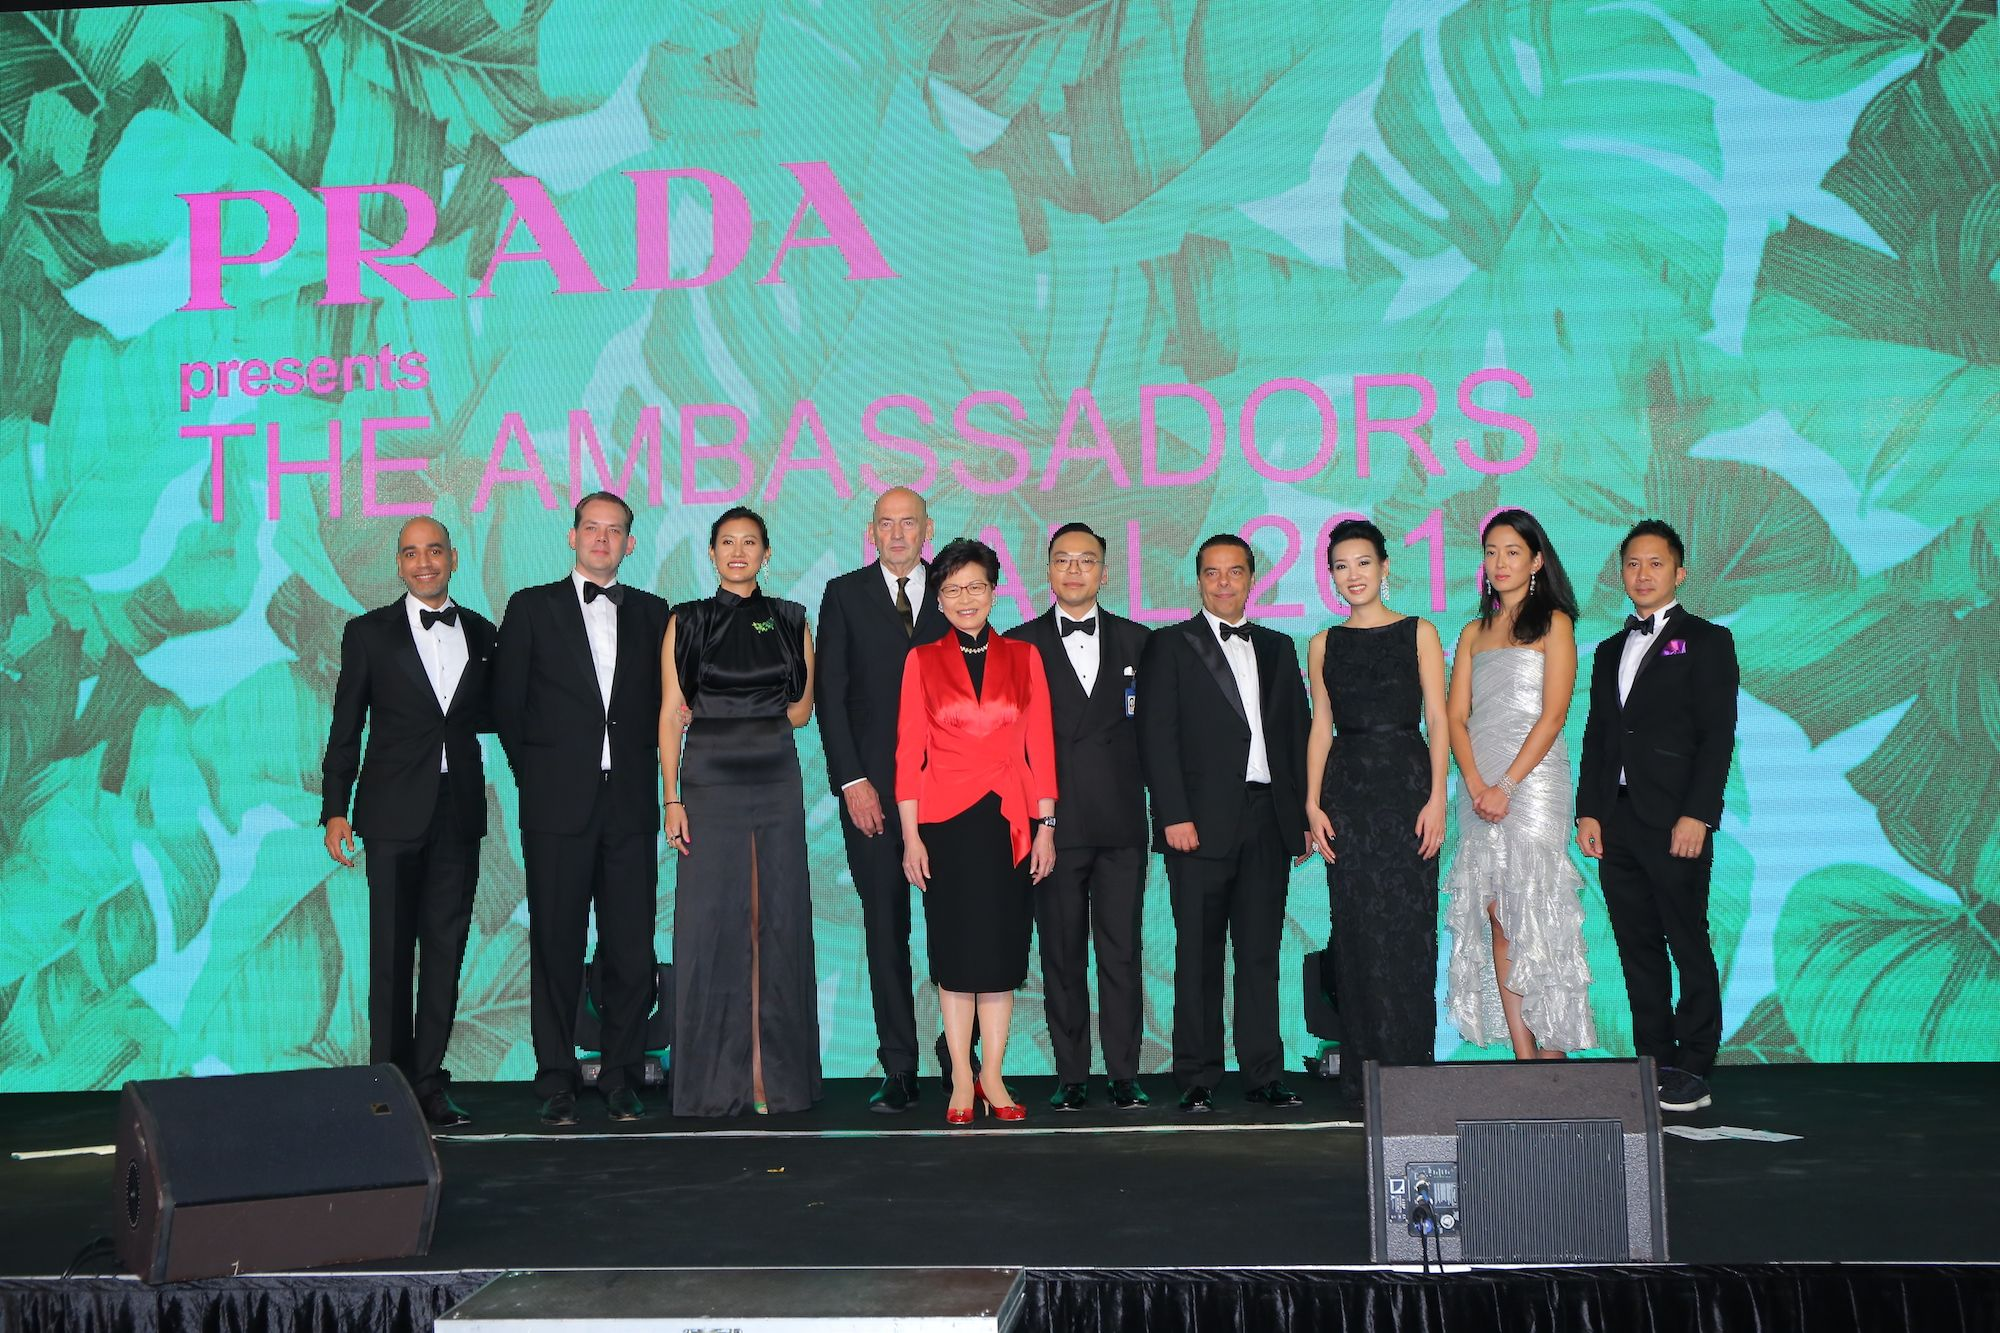 Jagdish Parmamand, David Gianotten, Marisa Yiu, Rem Koolhaas, Carrie Lam, Alan Lo, Armando Tolomelli, Joyce Tam, Hui Kuok-Gaw, Jehan Chu